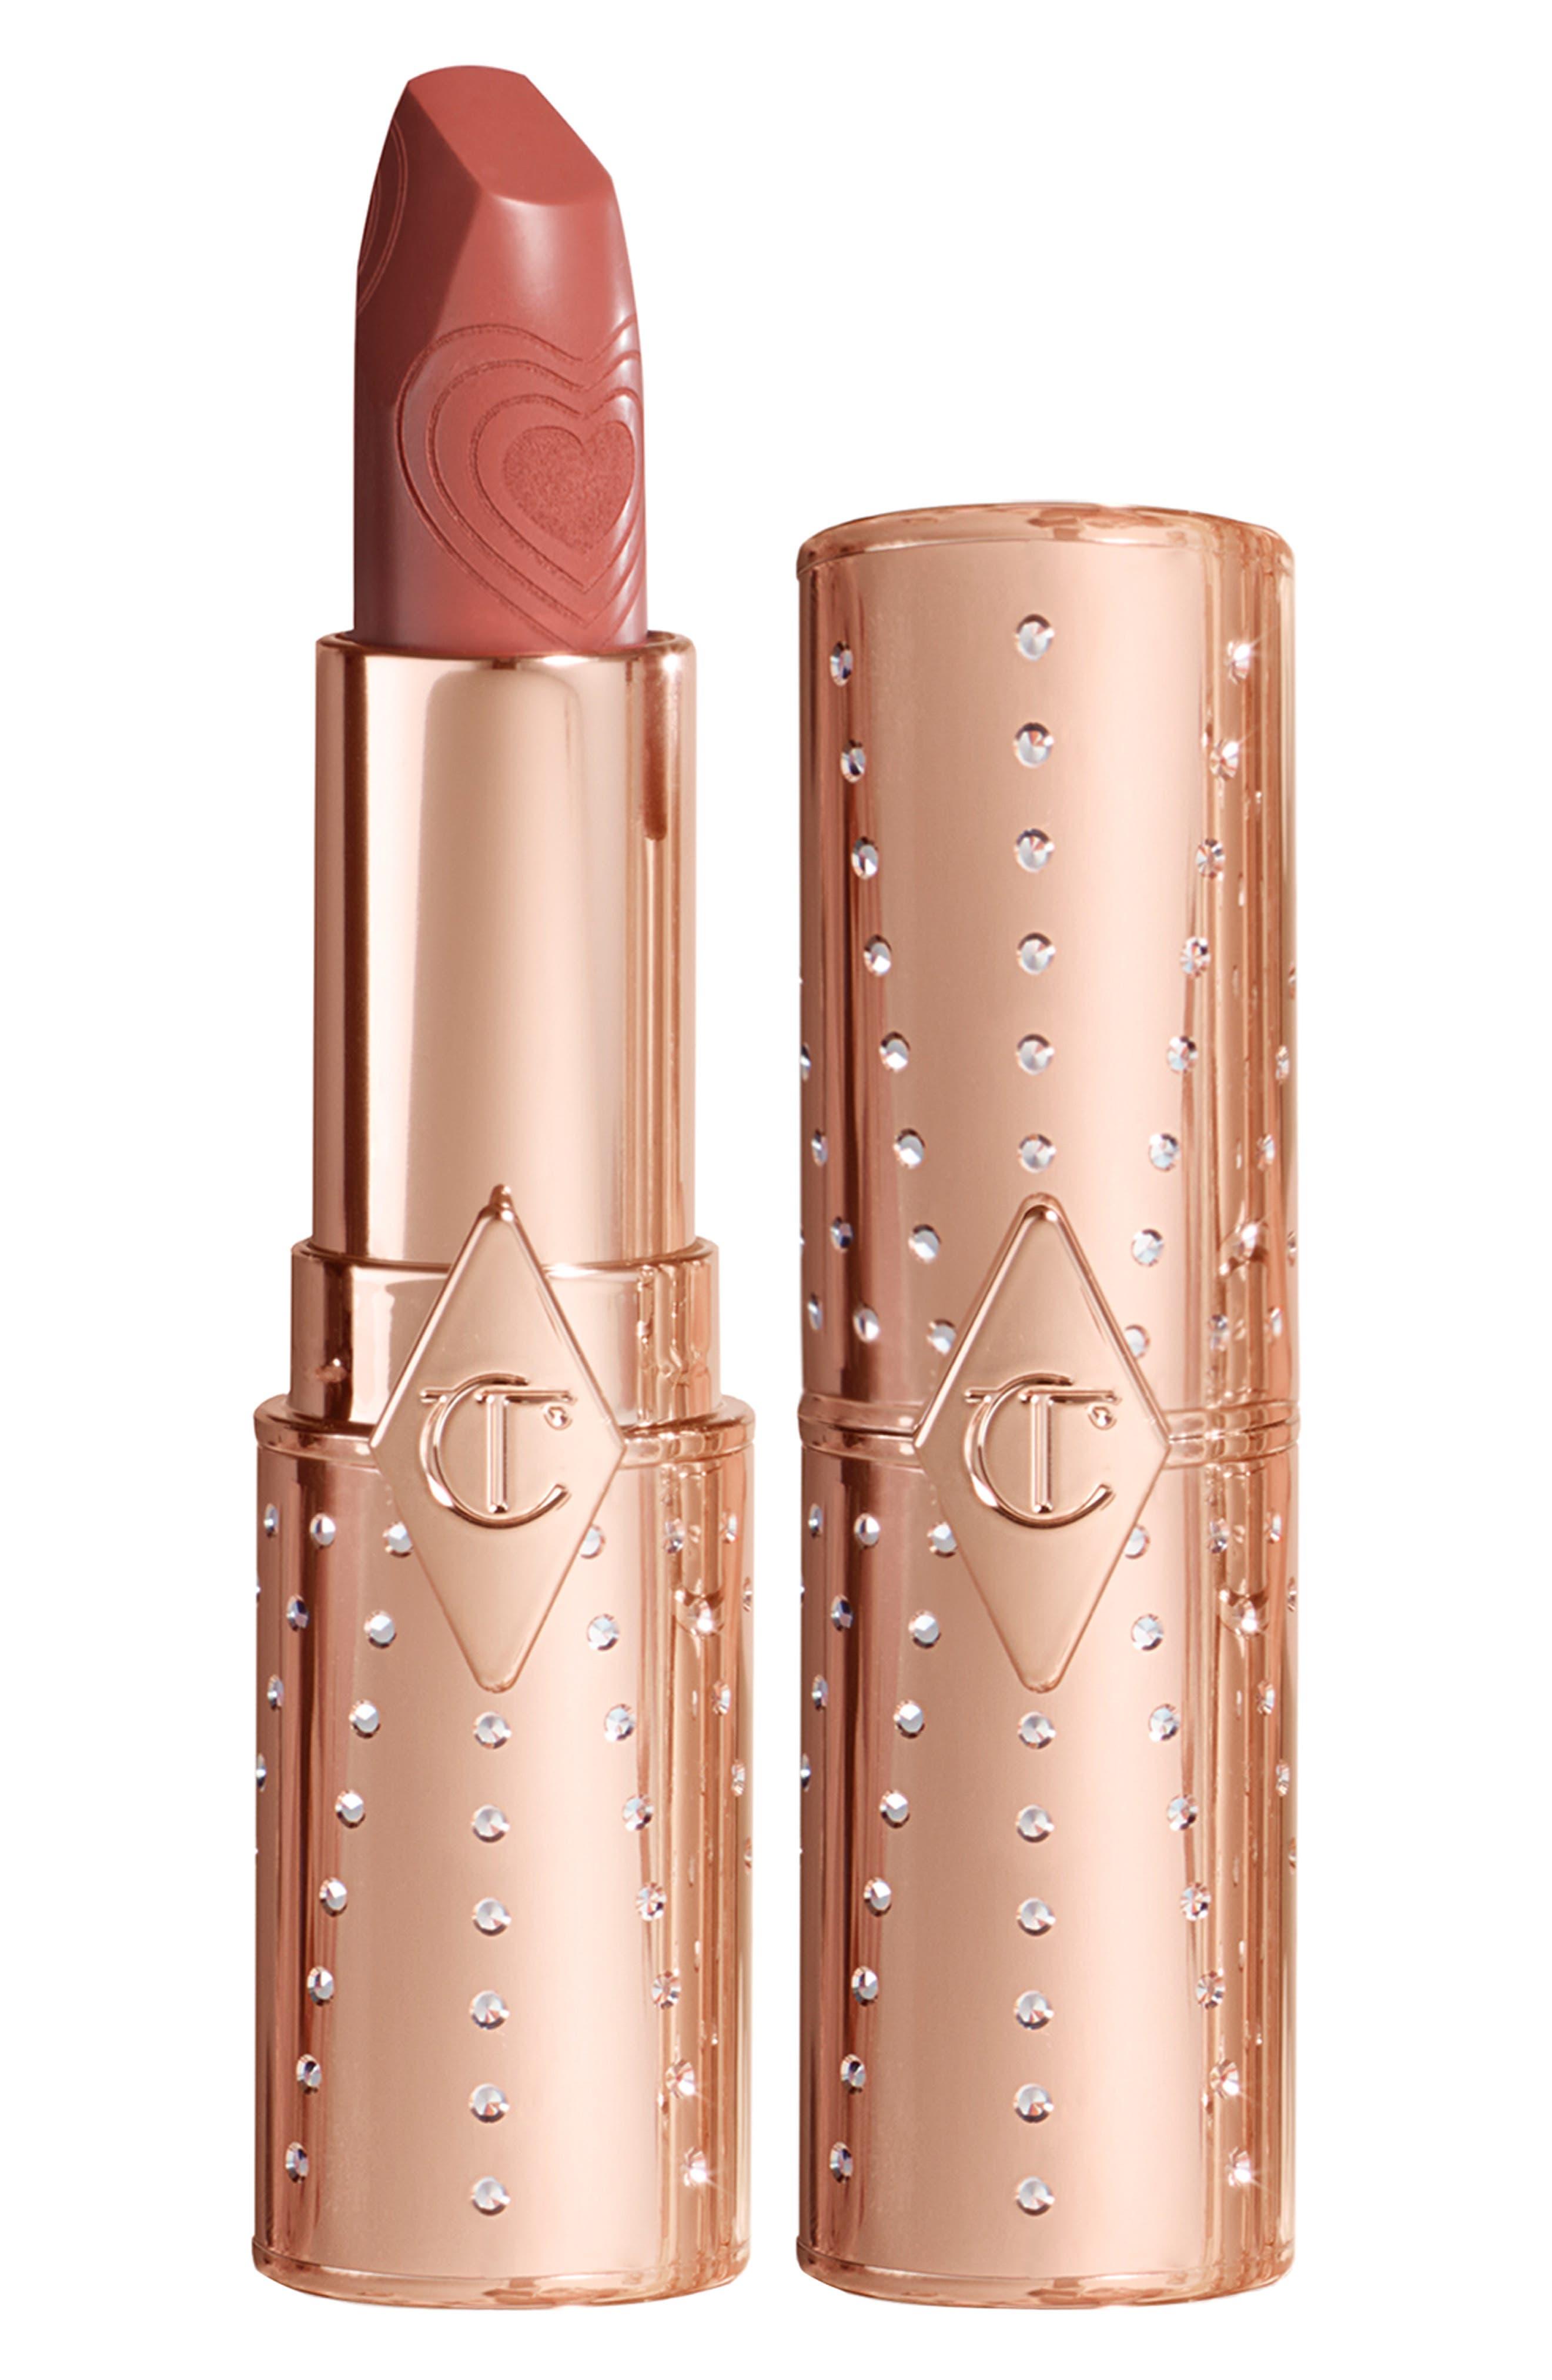 Nude Romance K.I.S.S.I.N.G Refillable Lipstick | Nordstrom